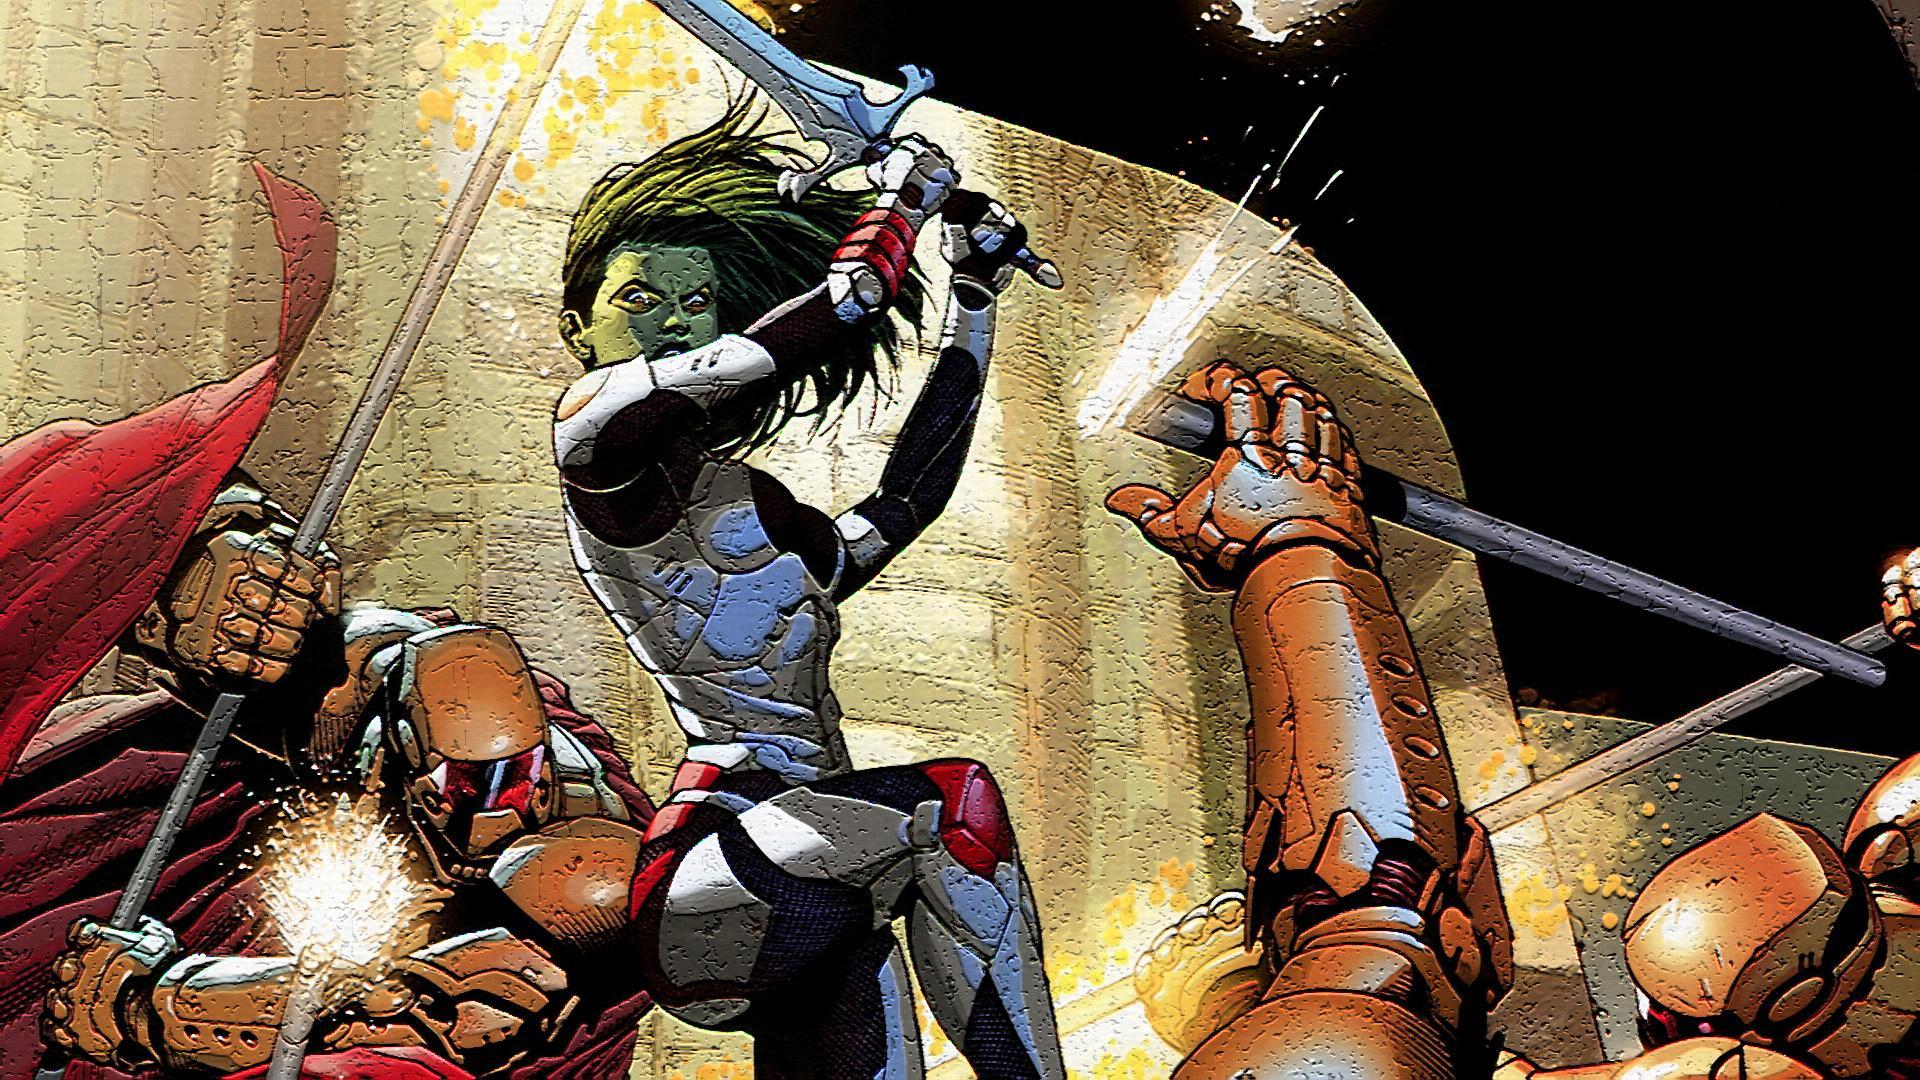 Gamora Comics wallpapers HD quality